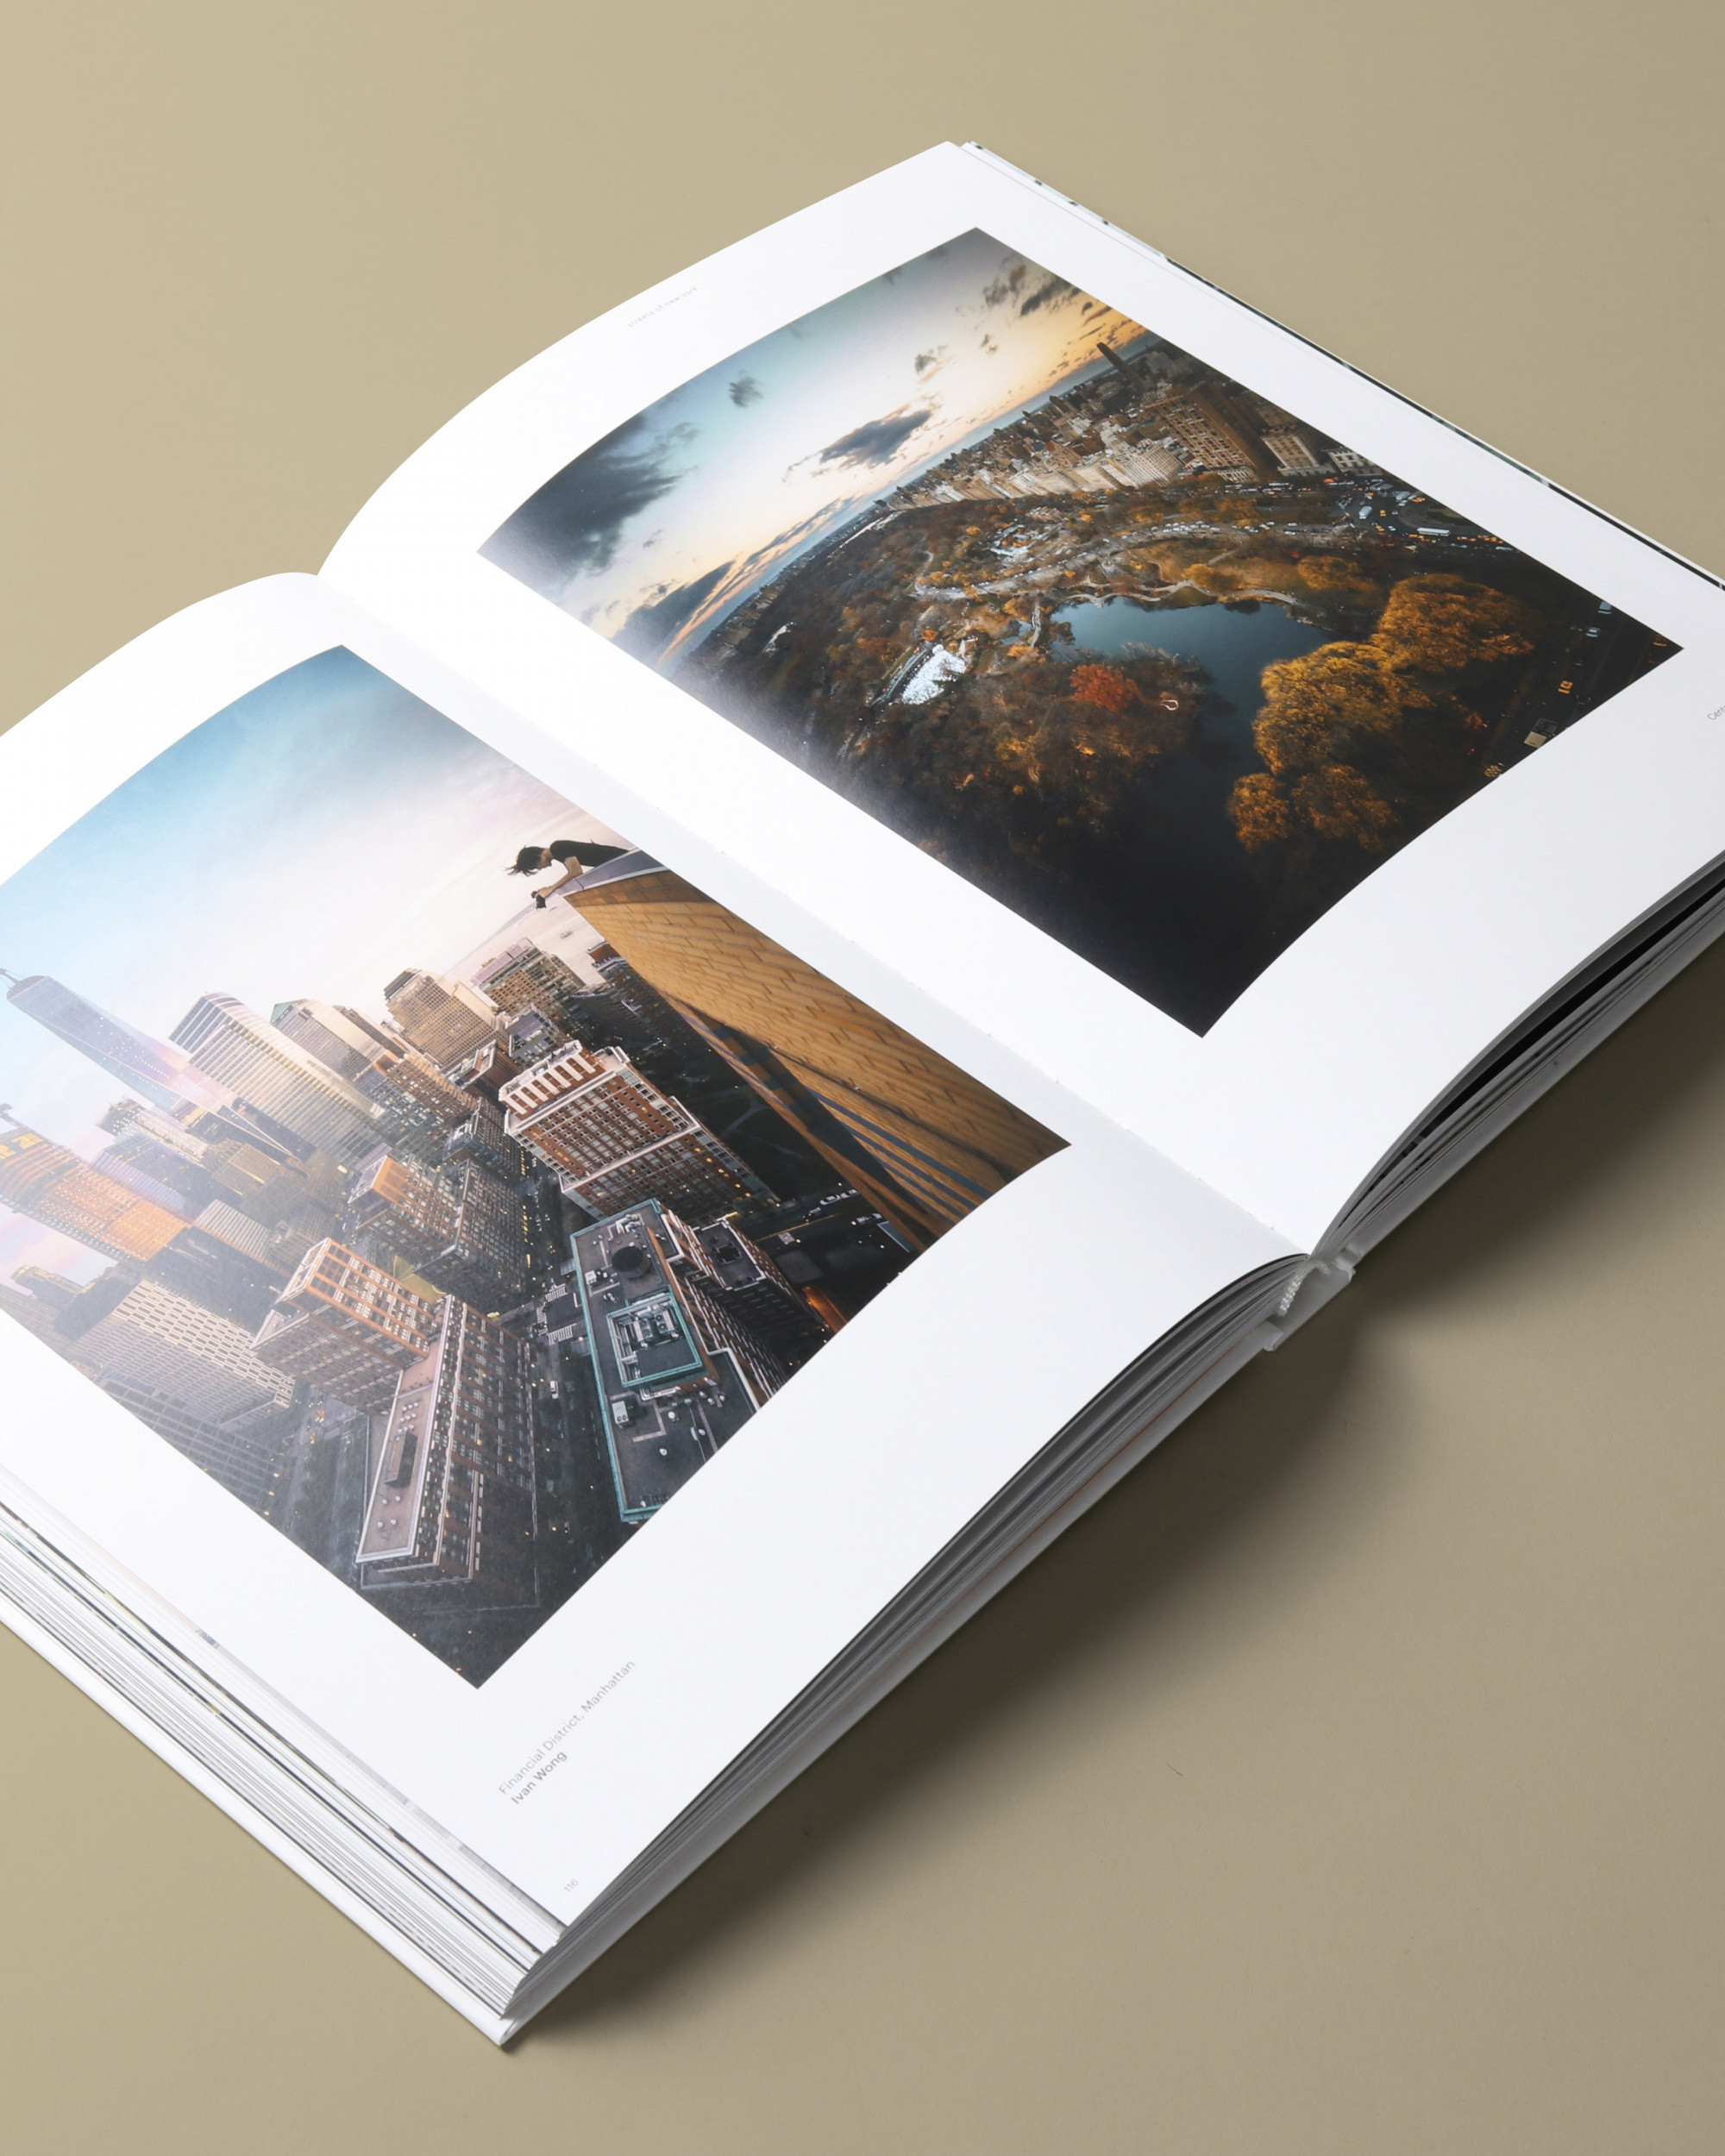 mendo-book-streets-of-new-york-13-1-2000x2500-c-default.jpg